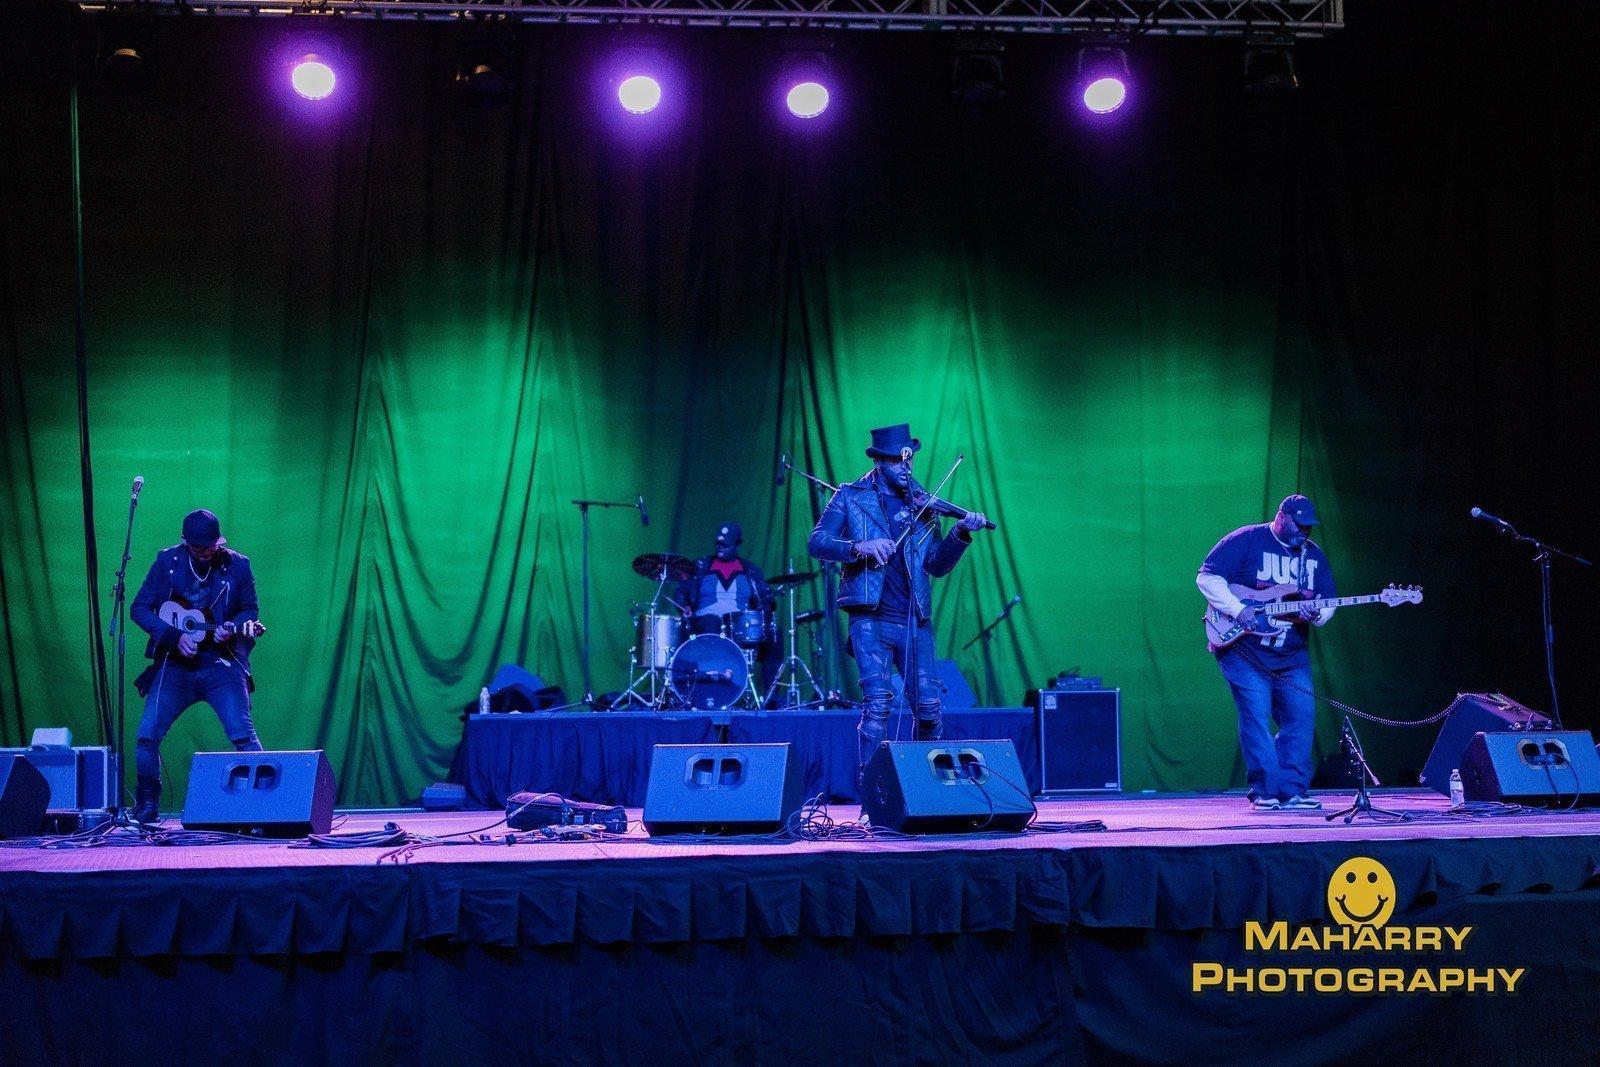 B2wins Brazilian 2wins Party Rock Band Iowa